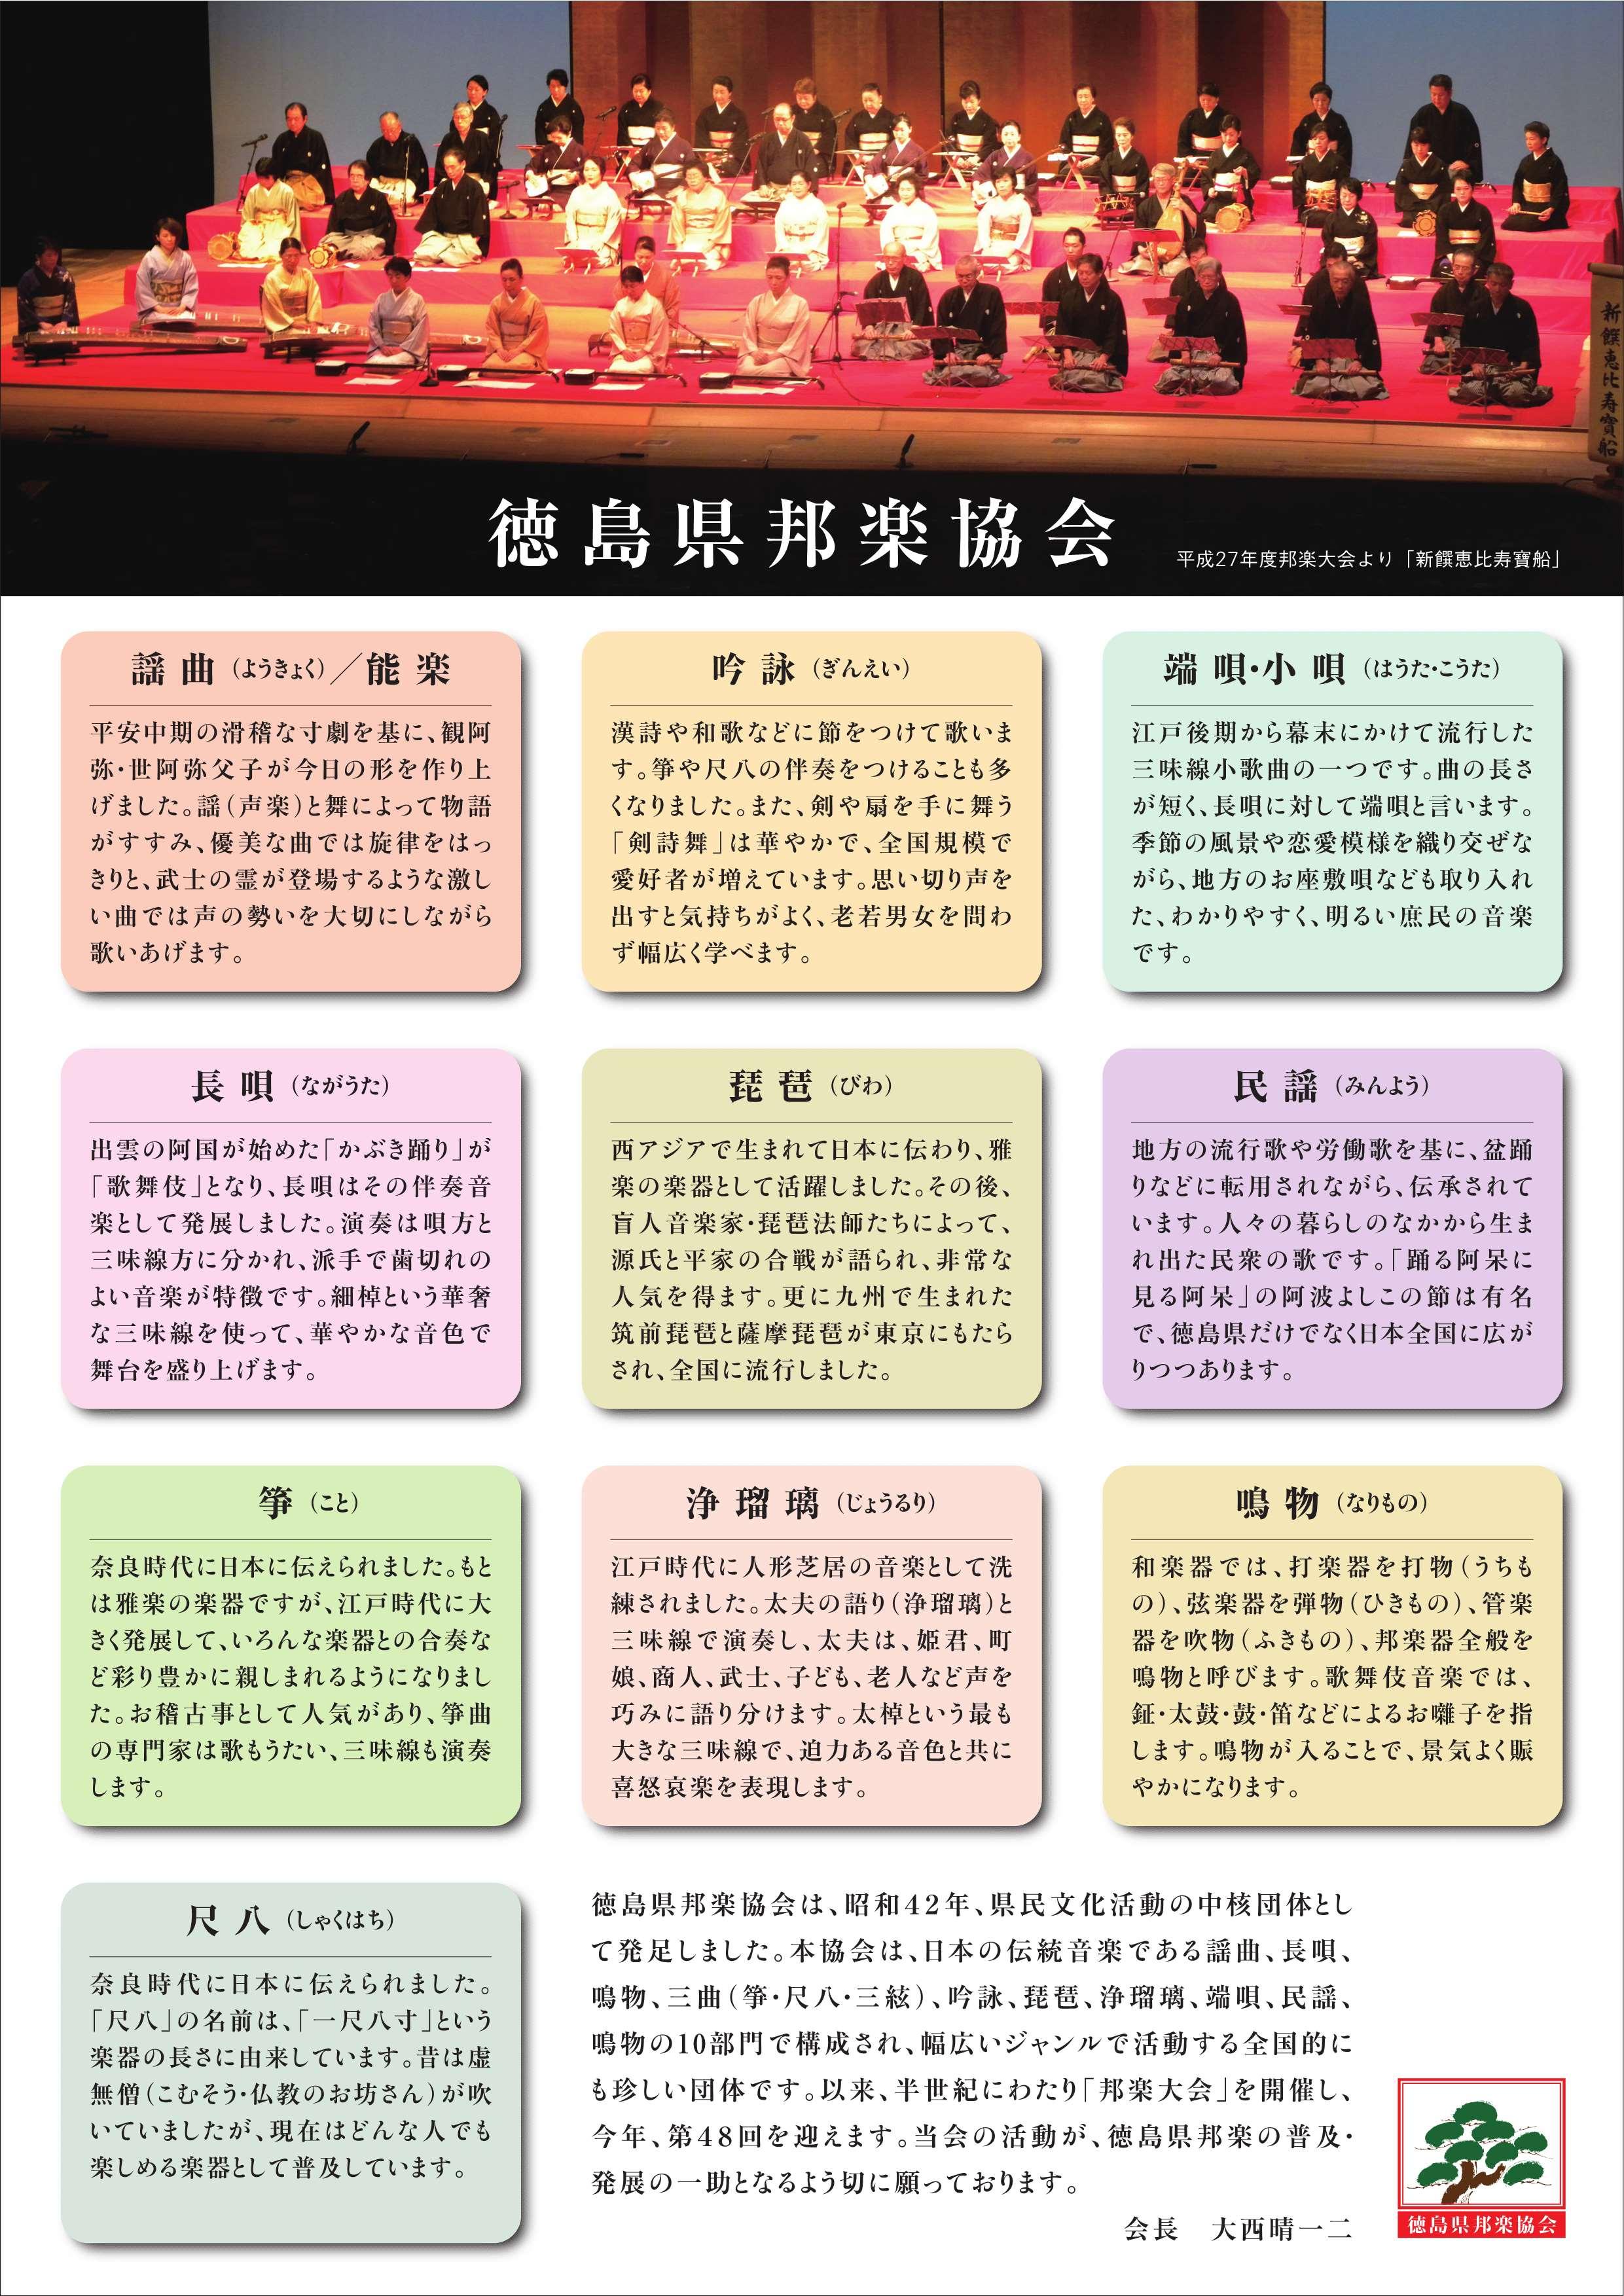 徳島県邦楽協会(お稽古場の案内)